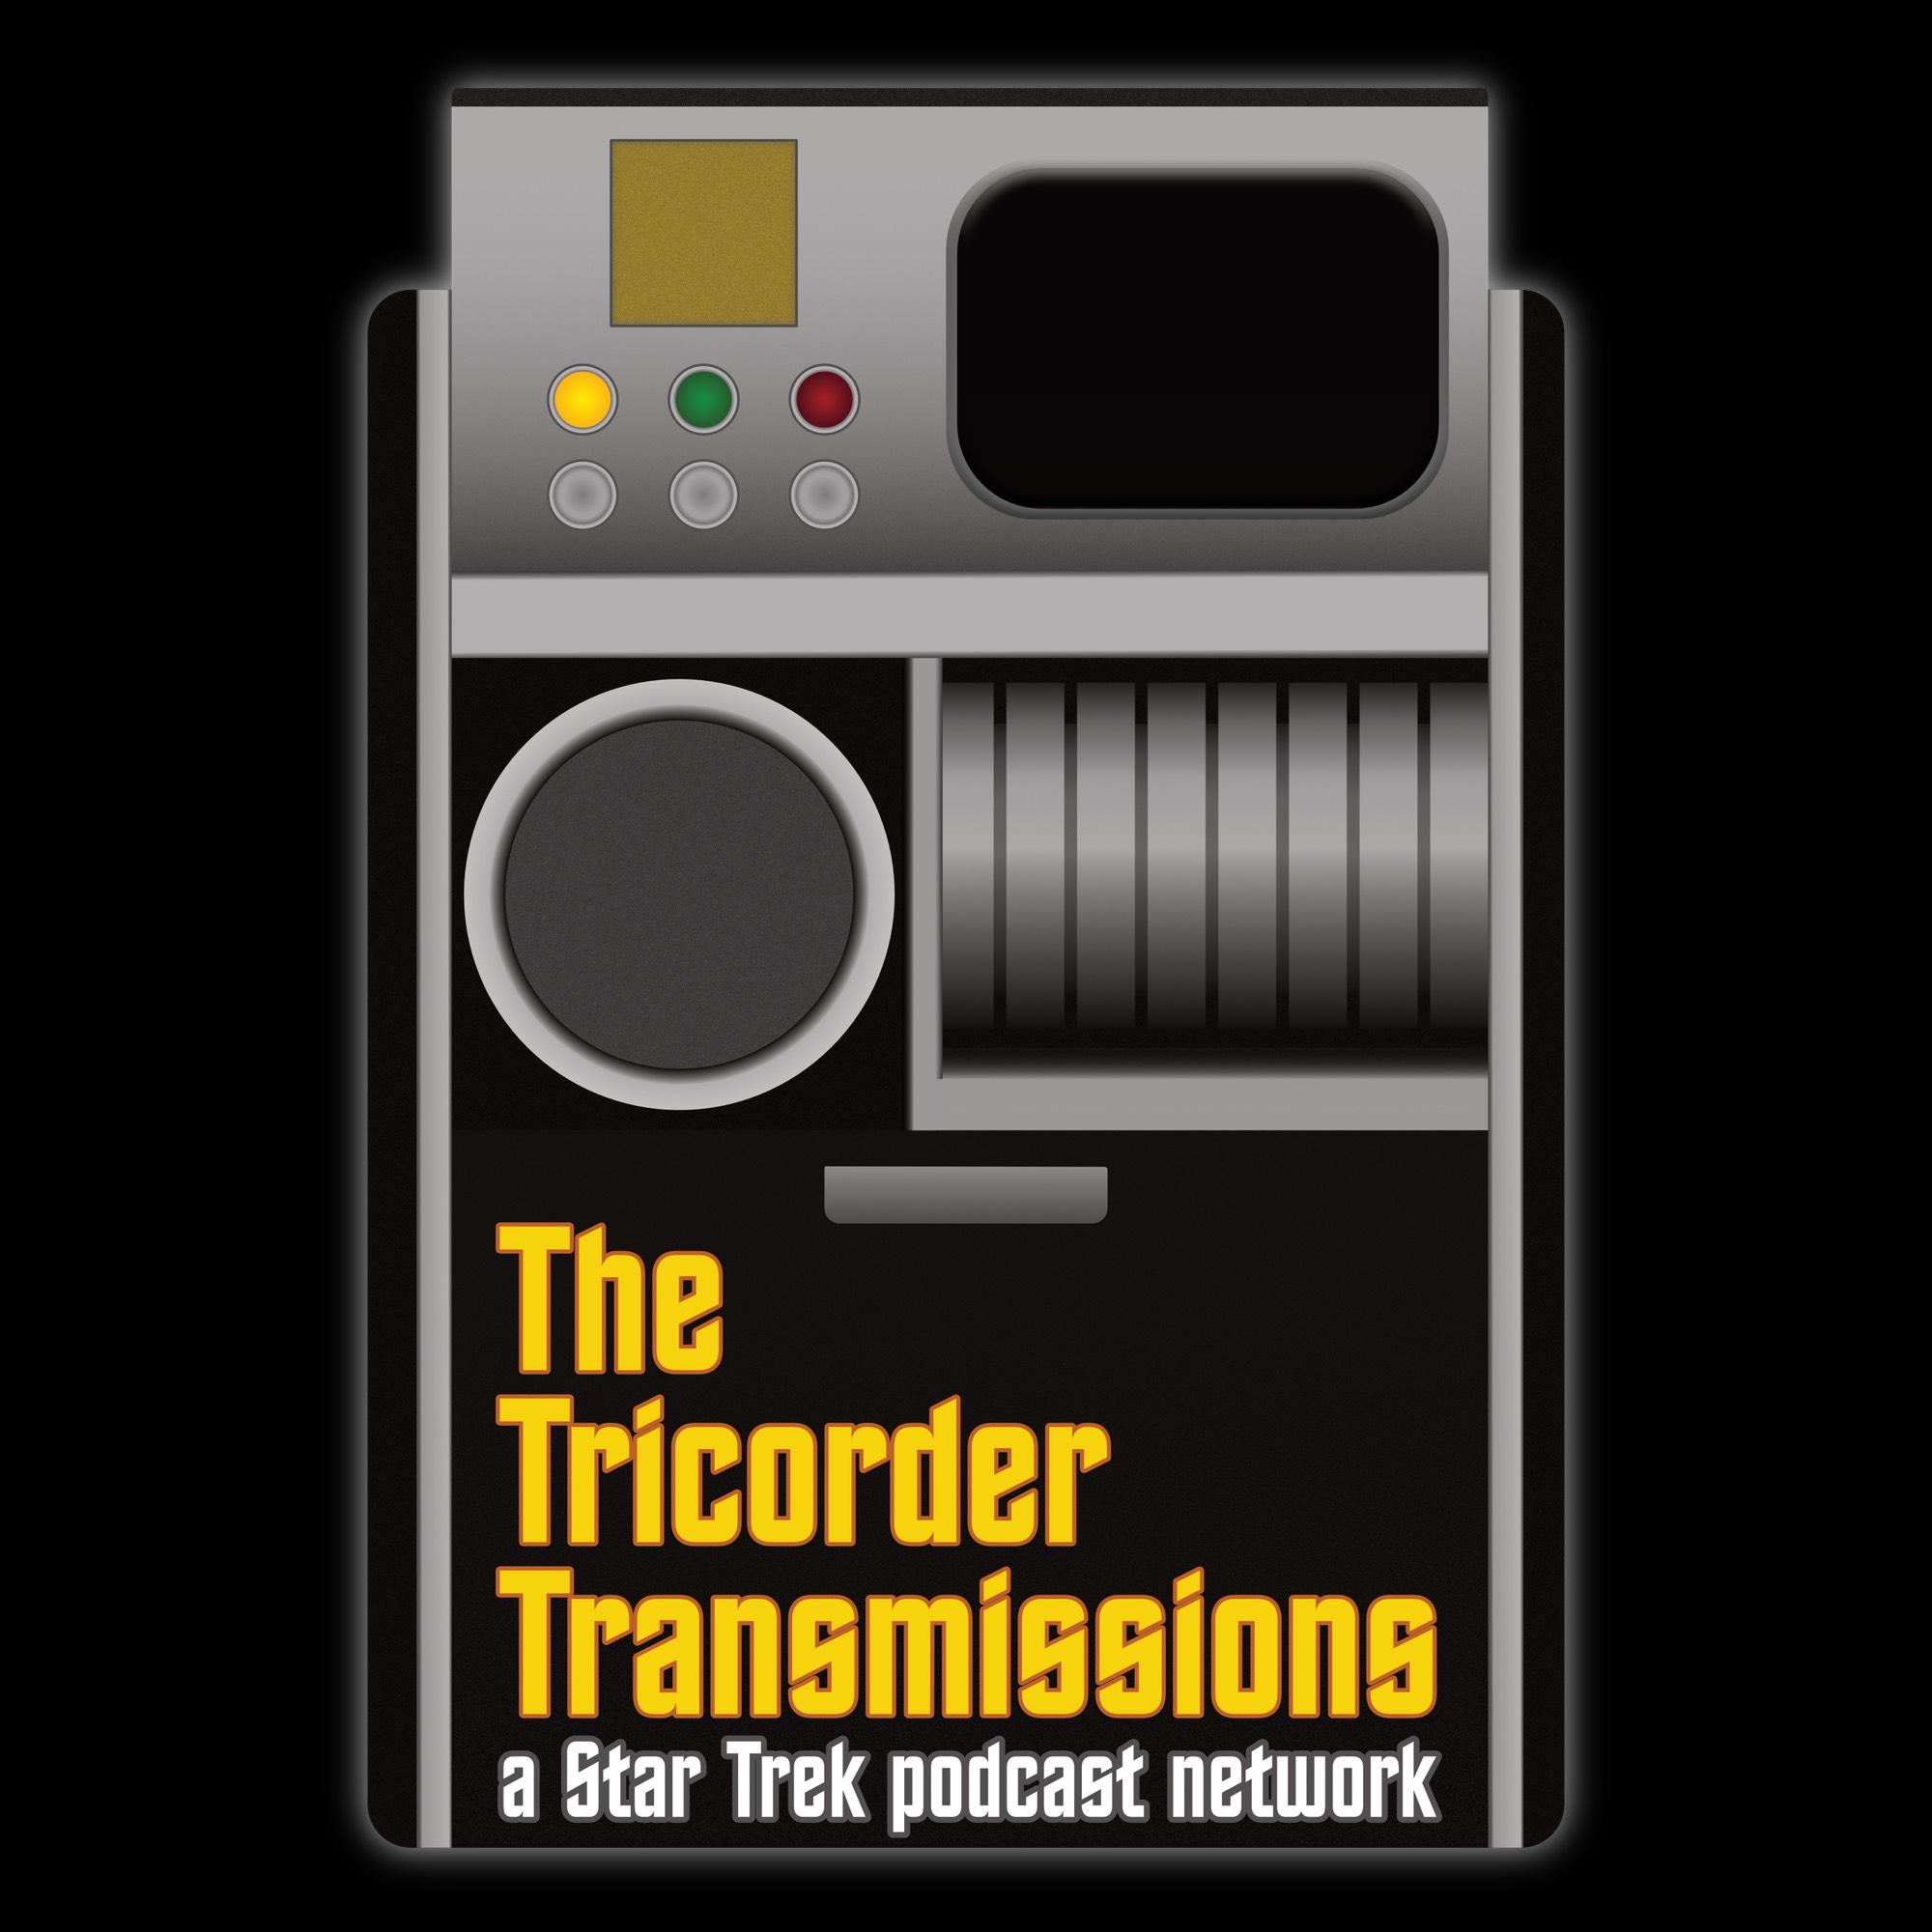 The Tricorder Transmissions : a Star Trek podcast | Listen